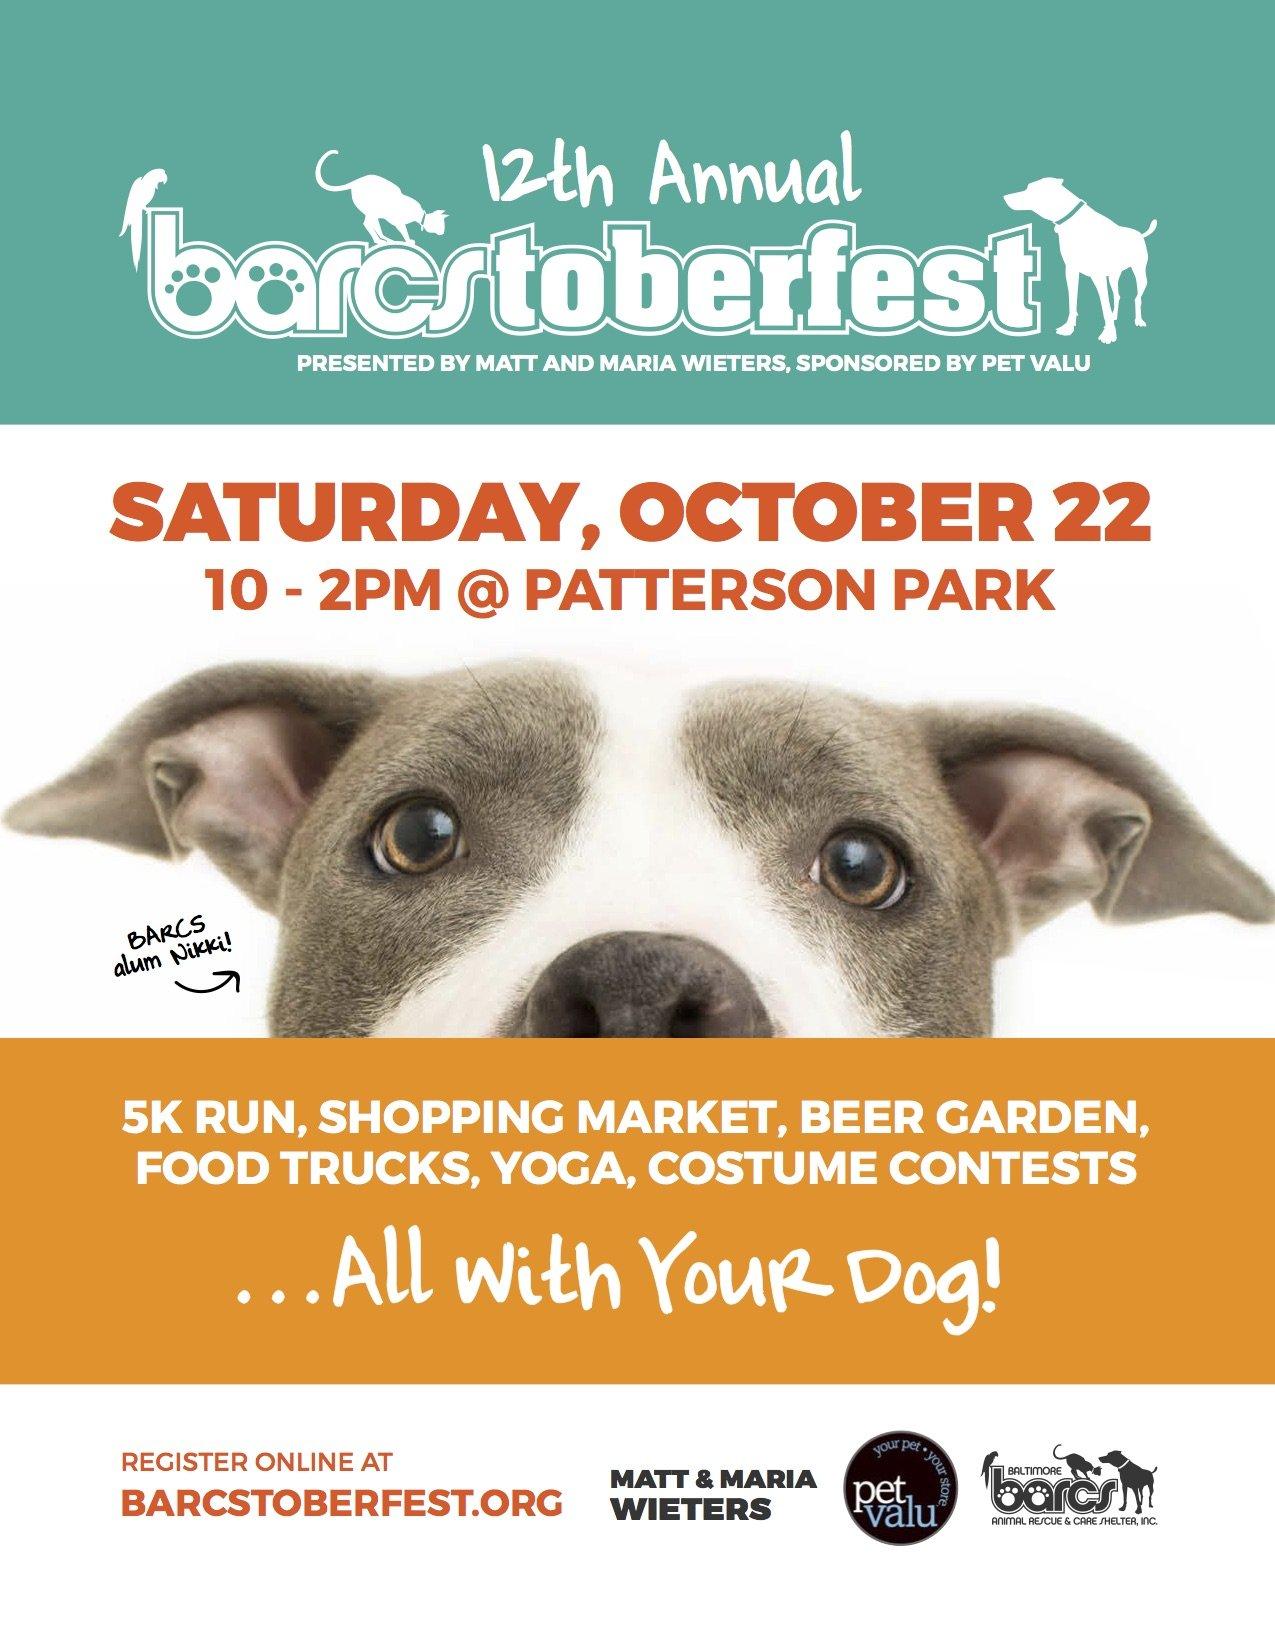 barcs-barcstoberfest-oct-22-2016_web